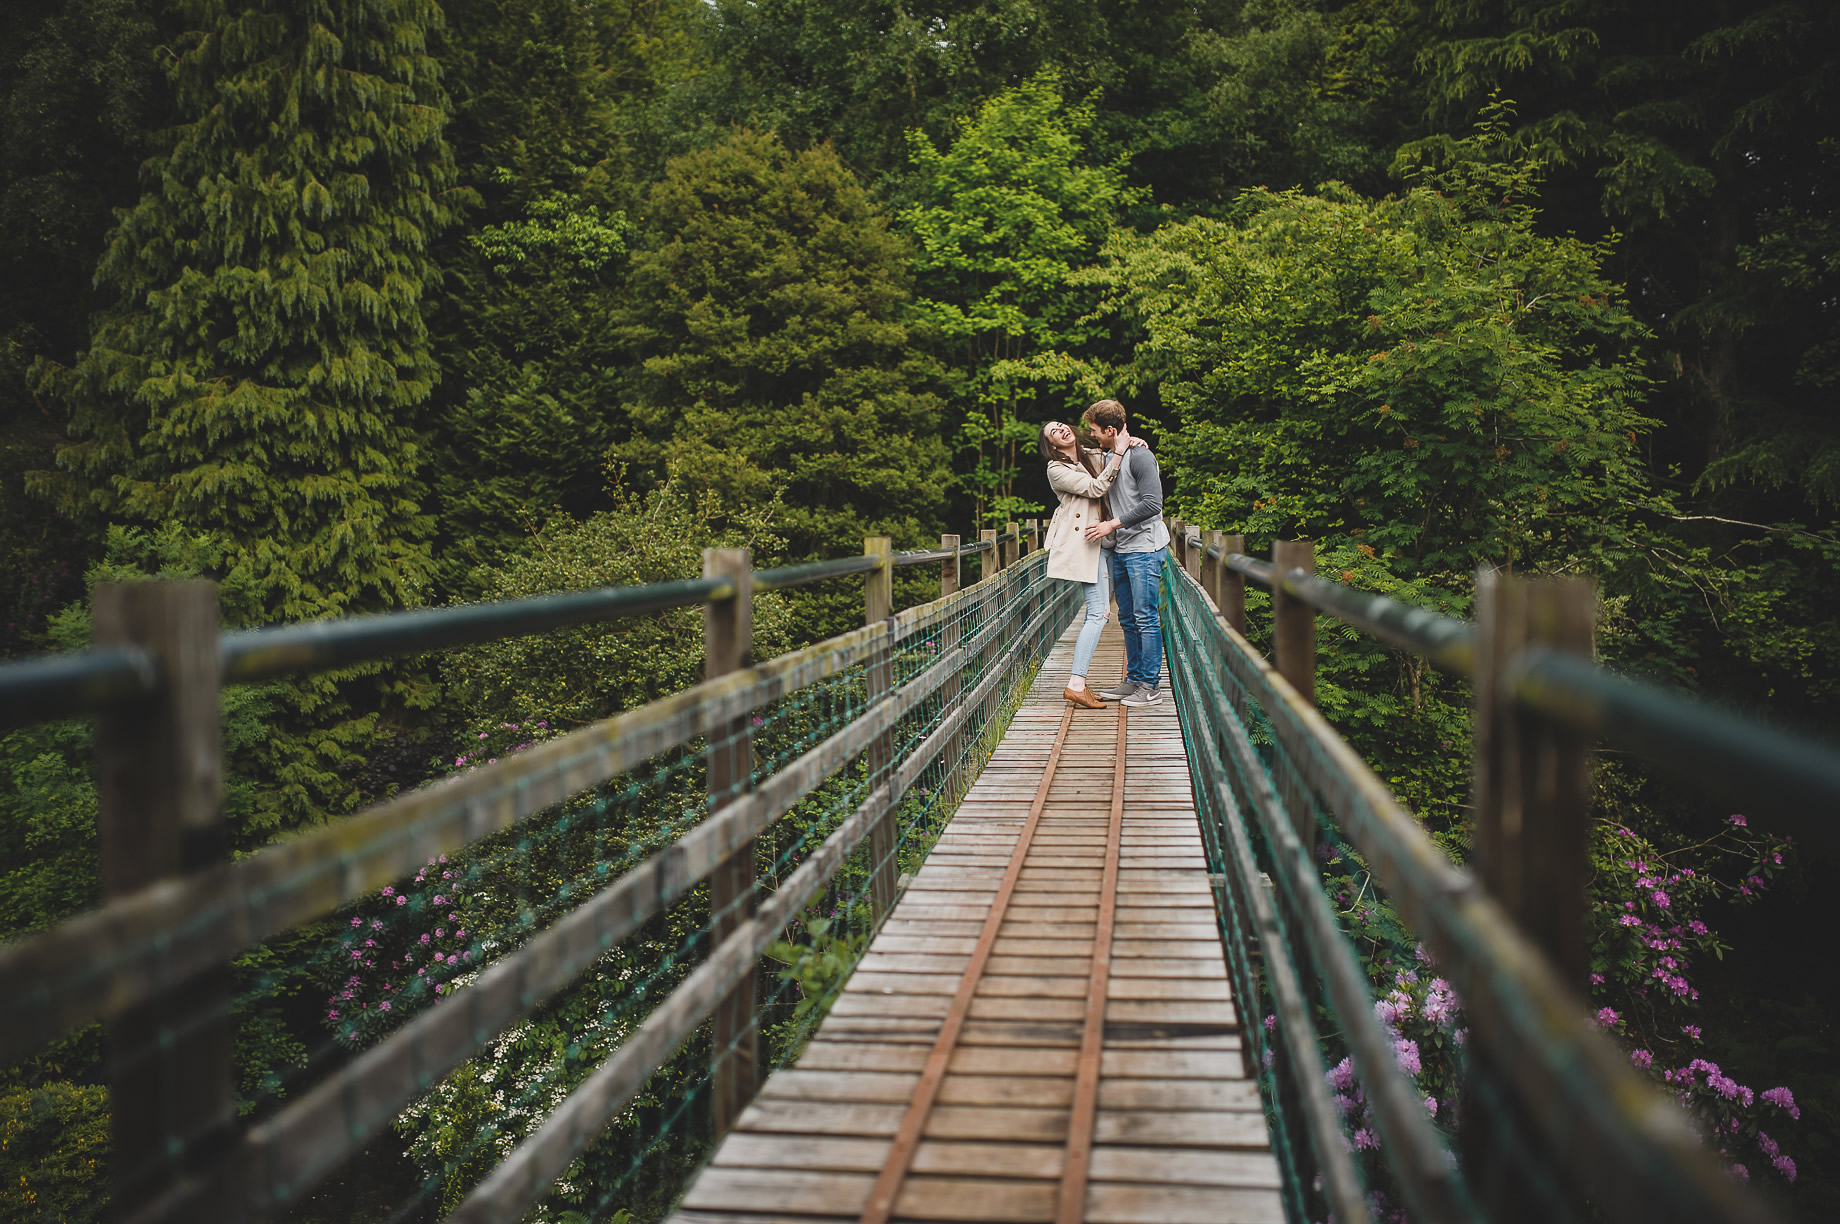 Becky and Emmett's Pre-Wedding Shoot in Scorton 002